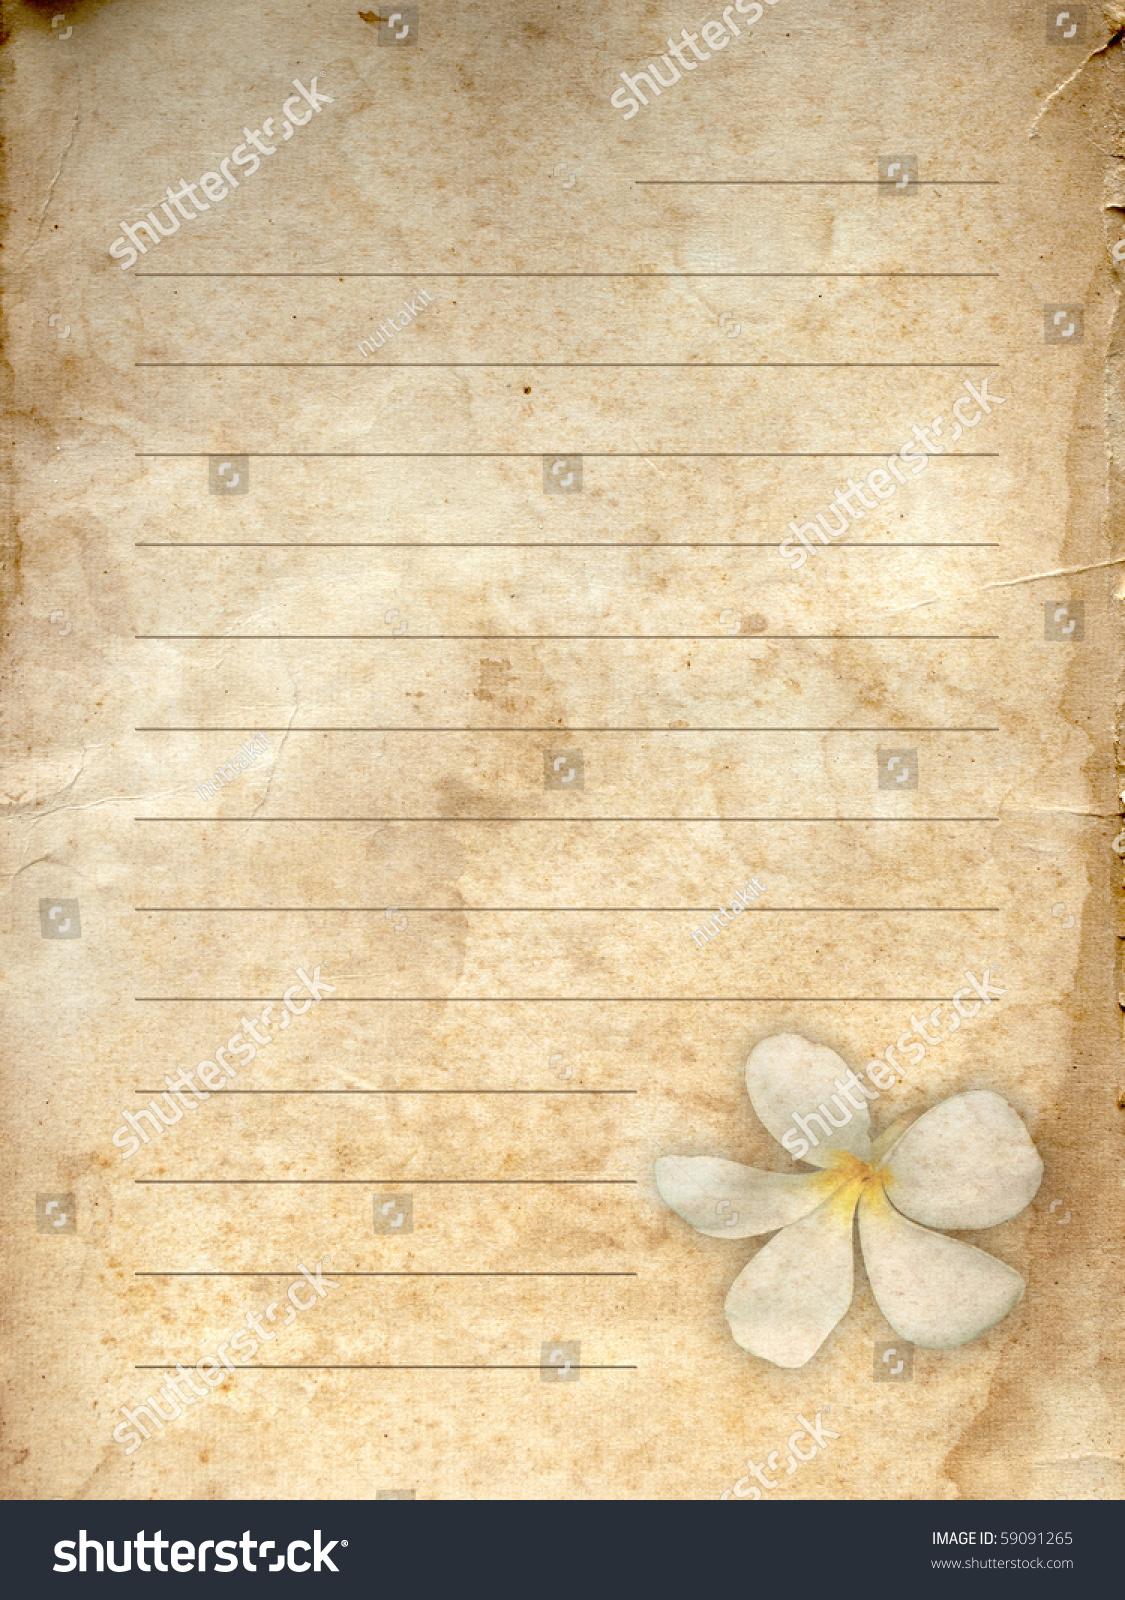 Old Grunge Letter Paper White Flower Stock Photo 59091265